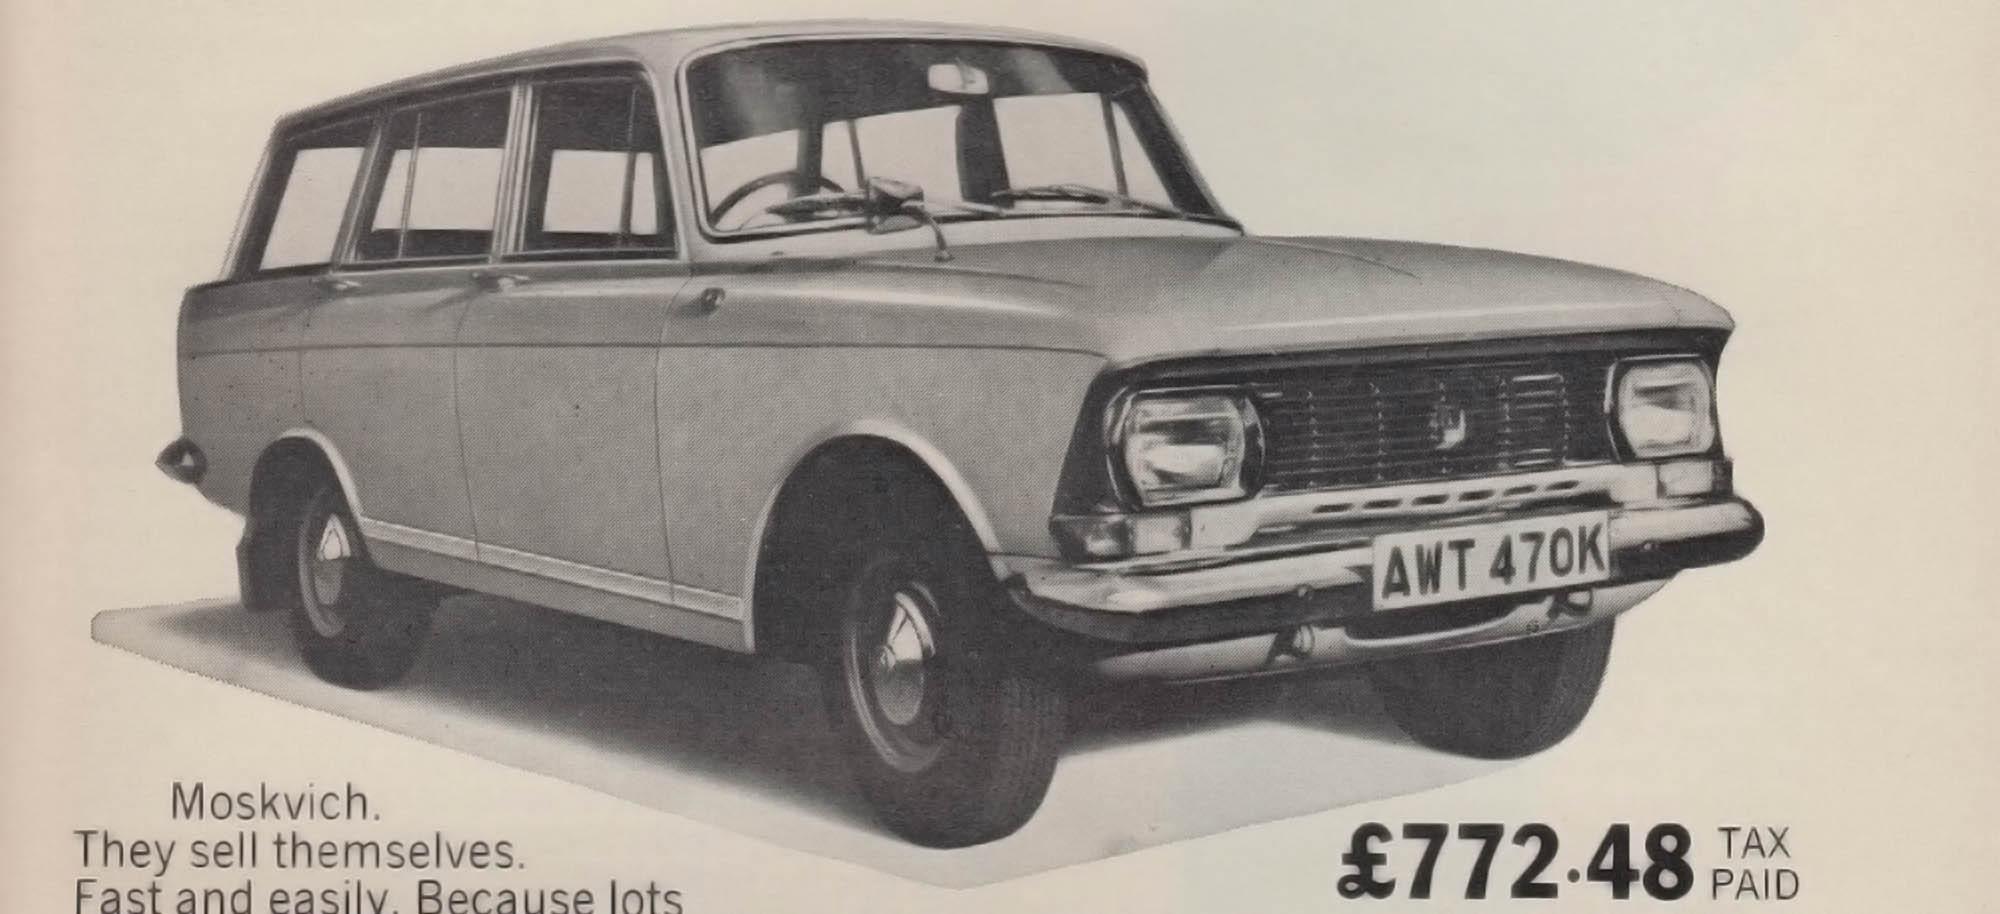 Moskvitch Dealer Advert 1972